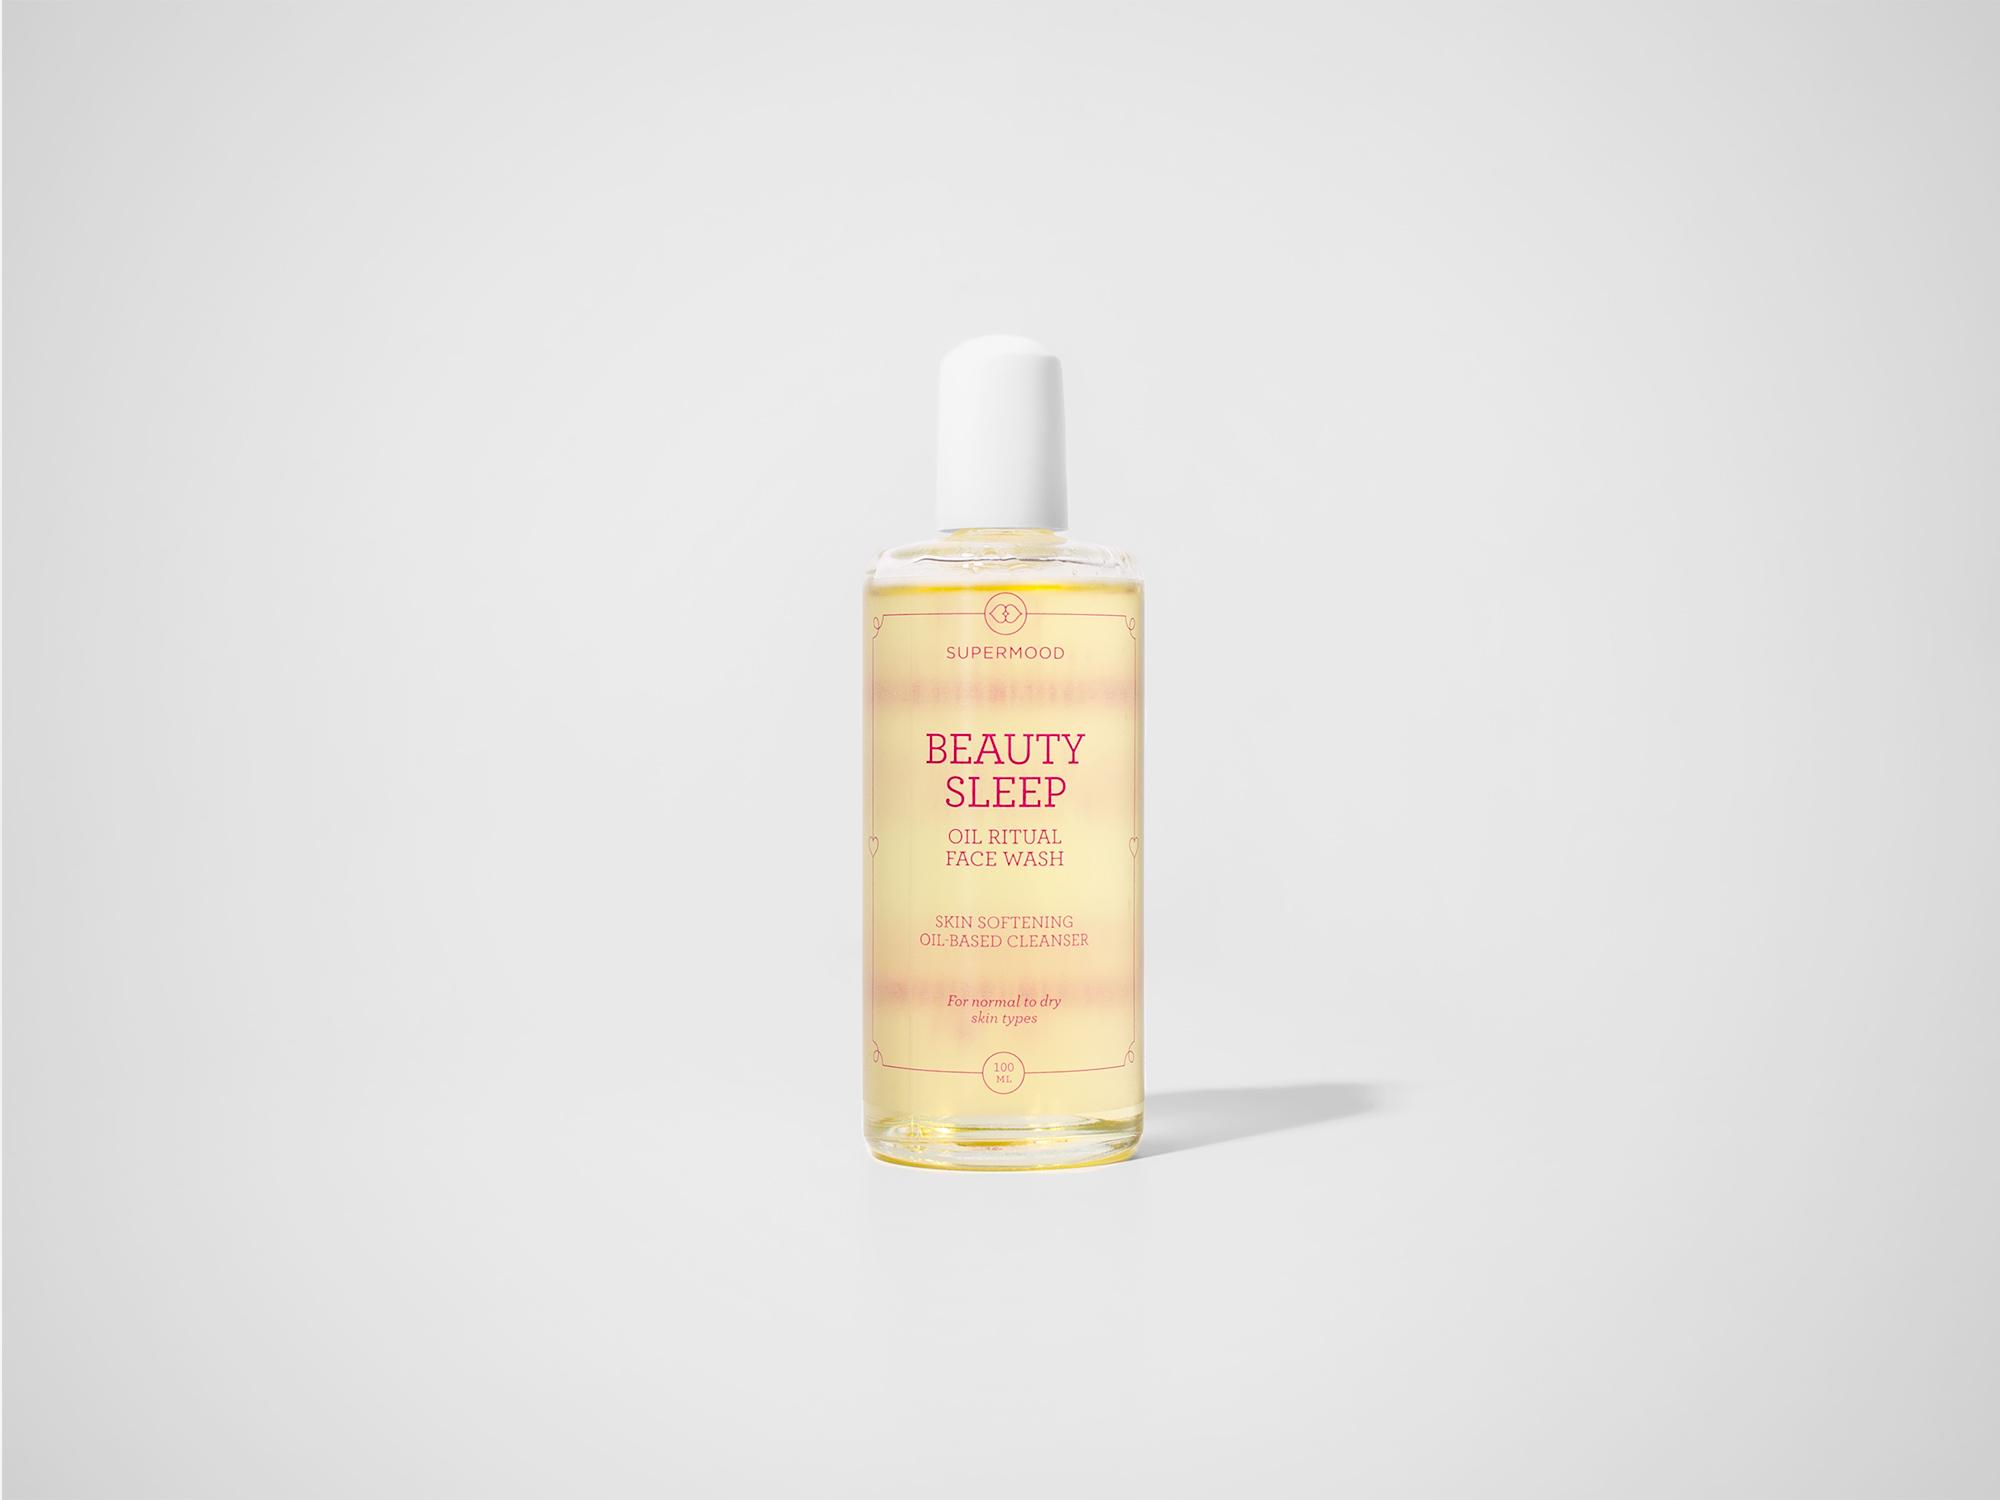 The-Skin-Supermood-Beauty-Sleep-Oil-Ritual-Face-Wash-100ml.jpg